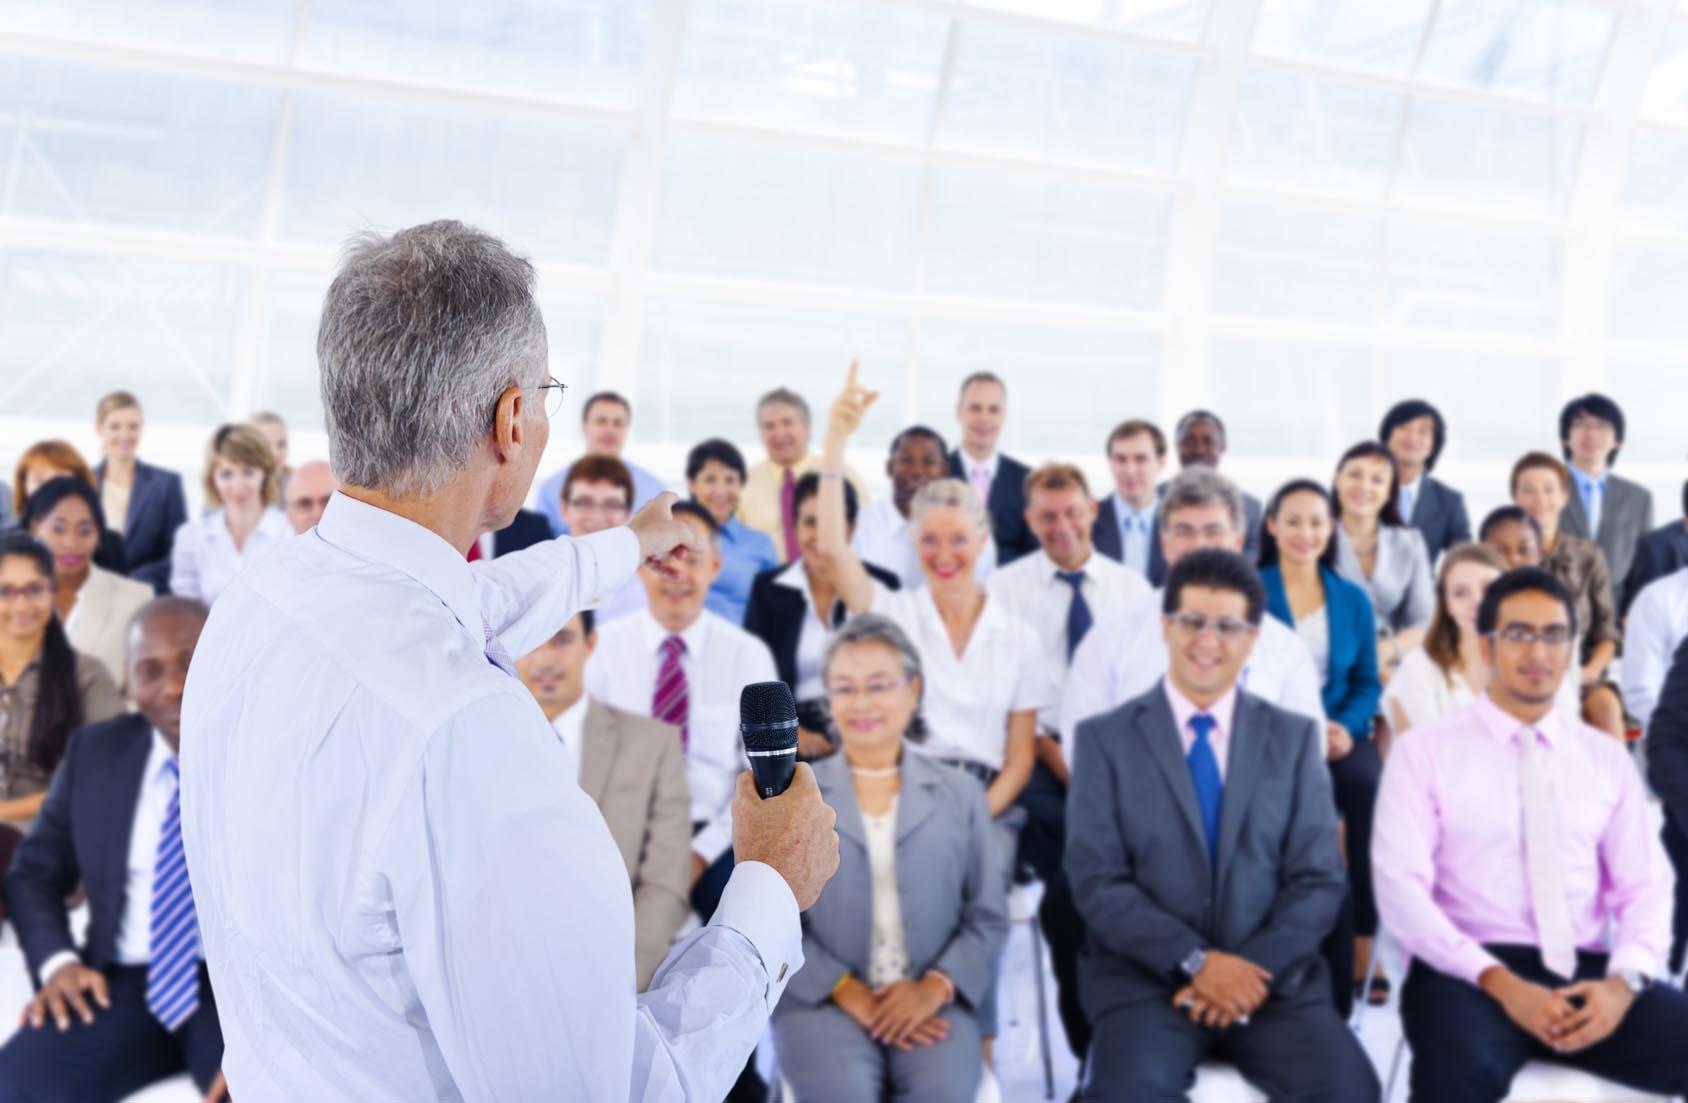 deversity-business-people-corporate-team-seminar-concept